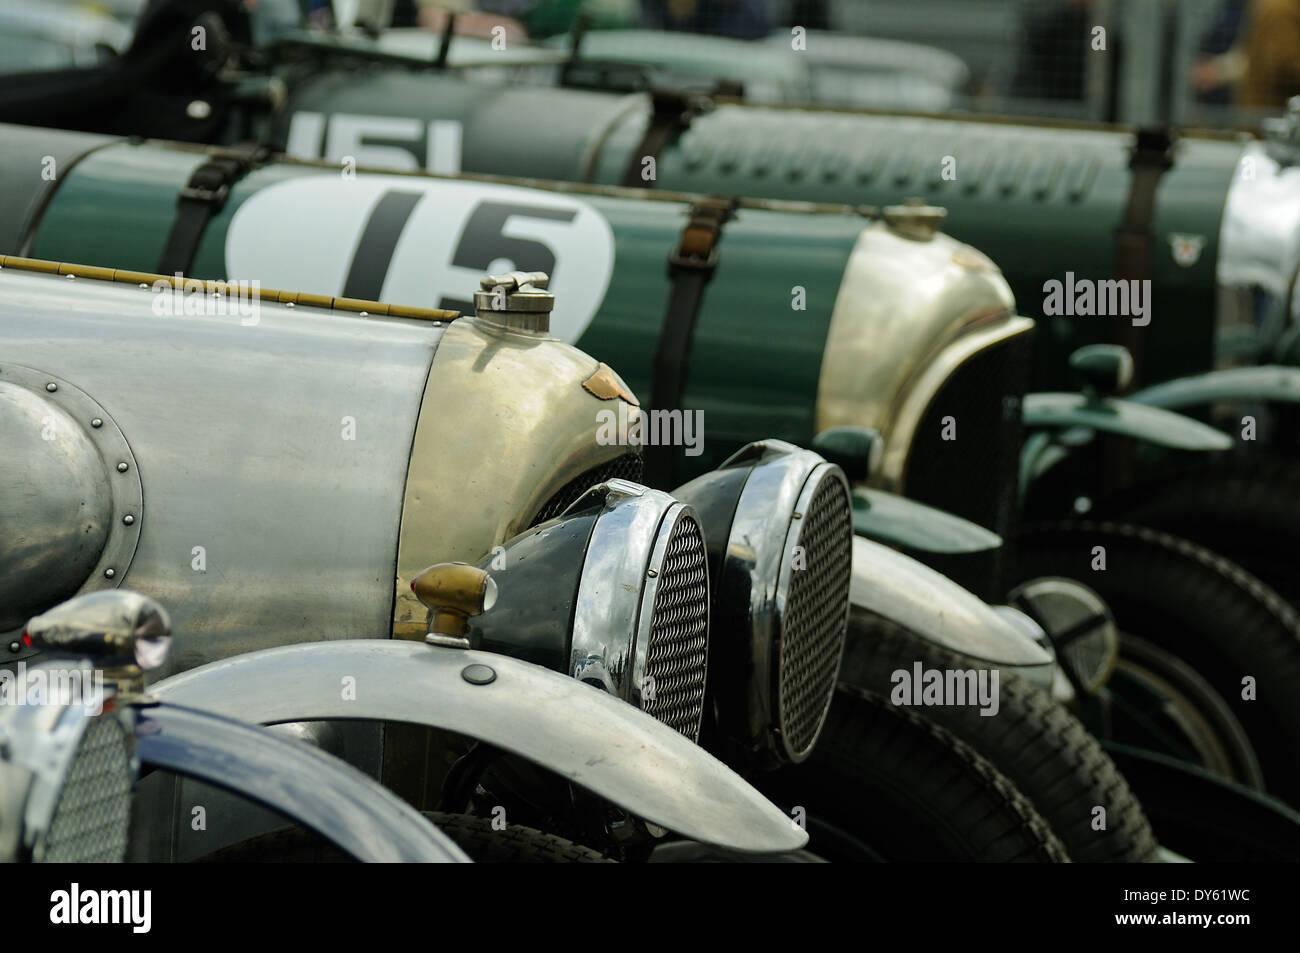 Vintage Bentleys line up at Donington Park for a race - Stock Image